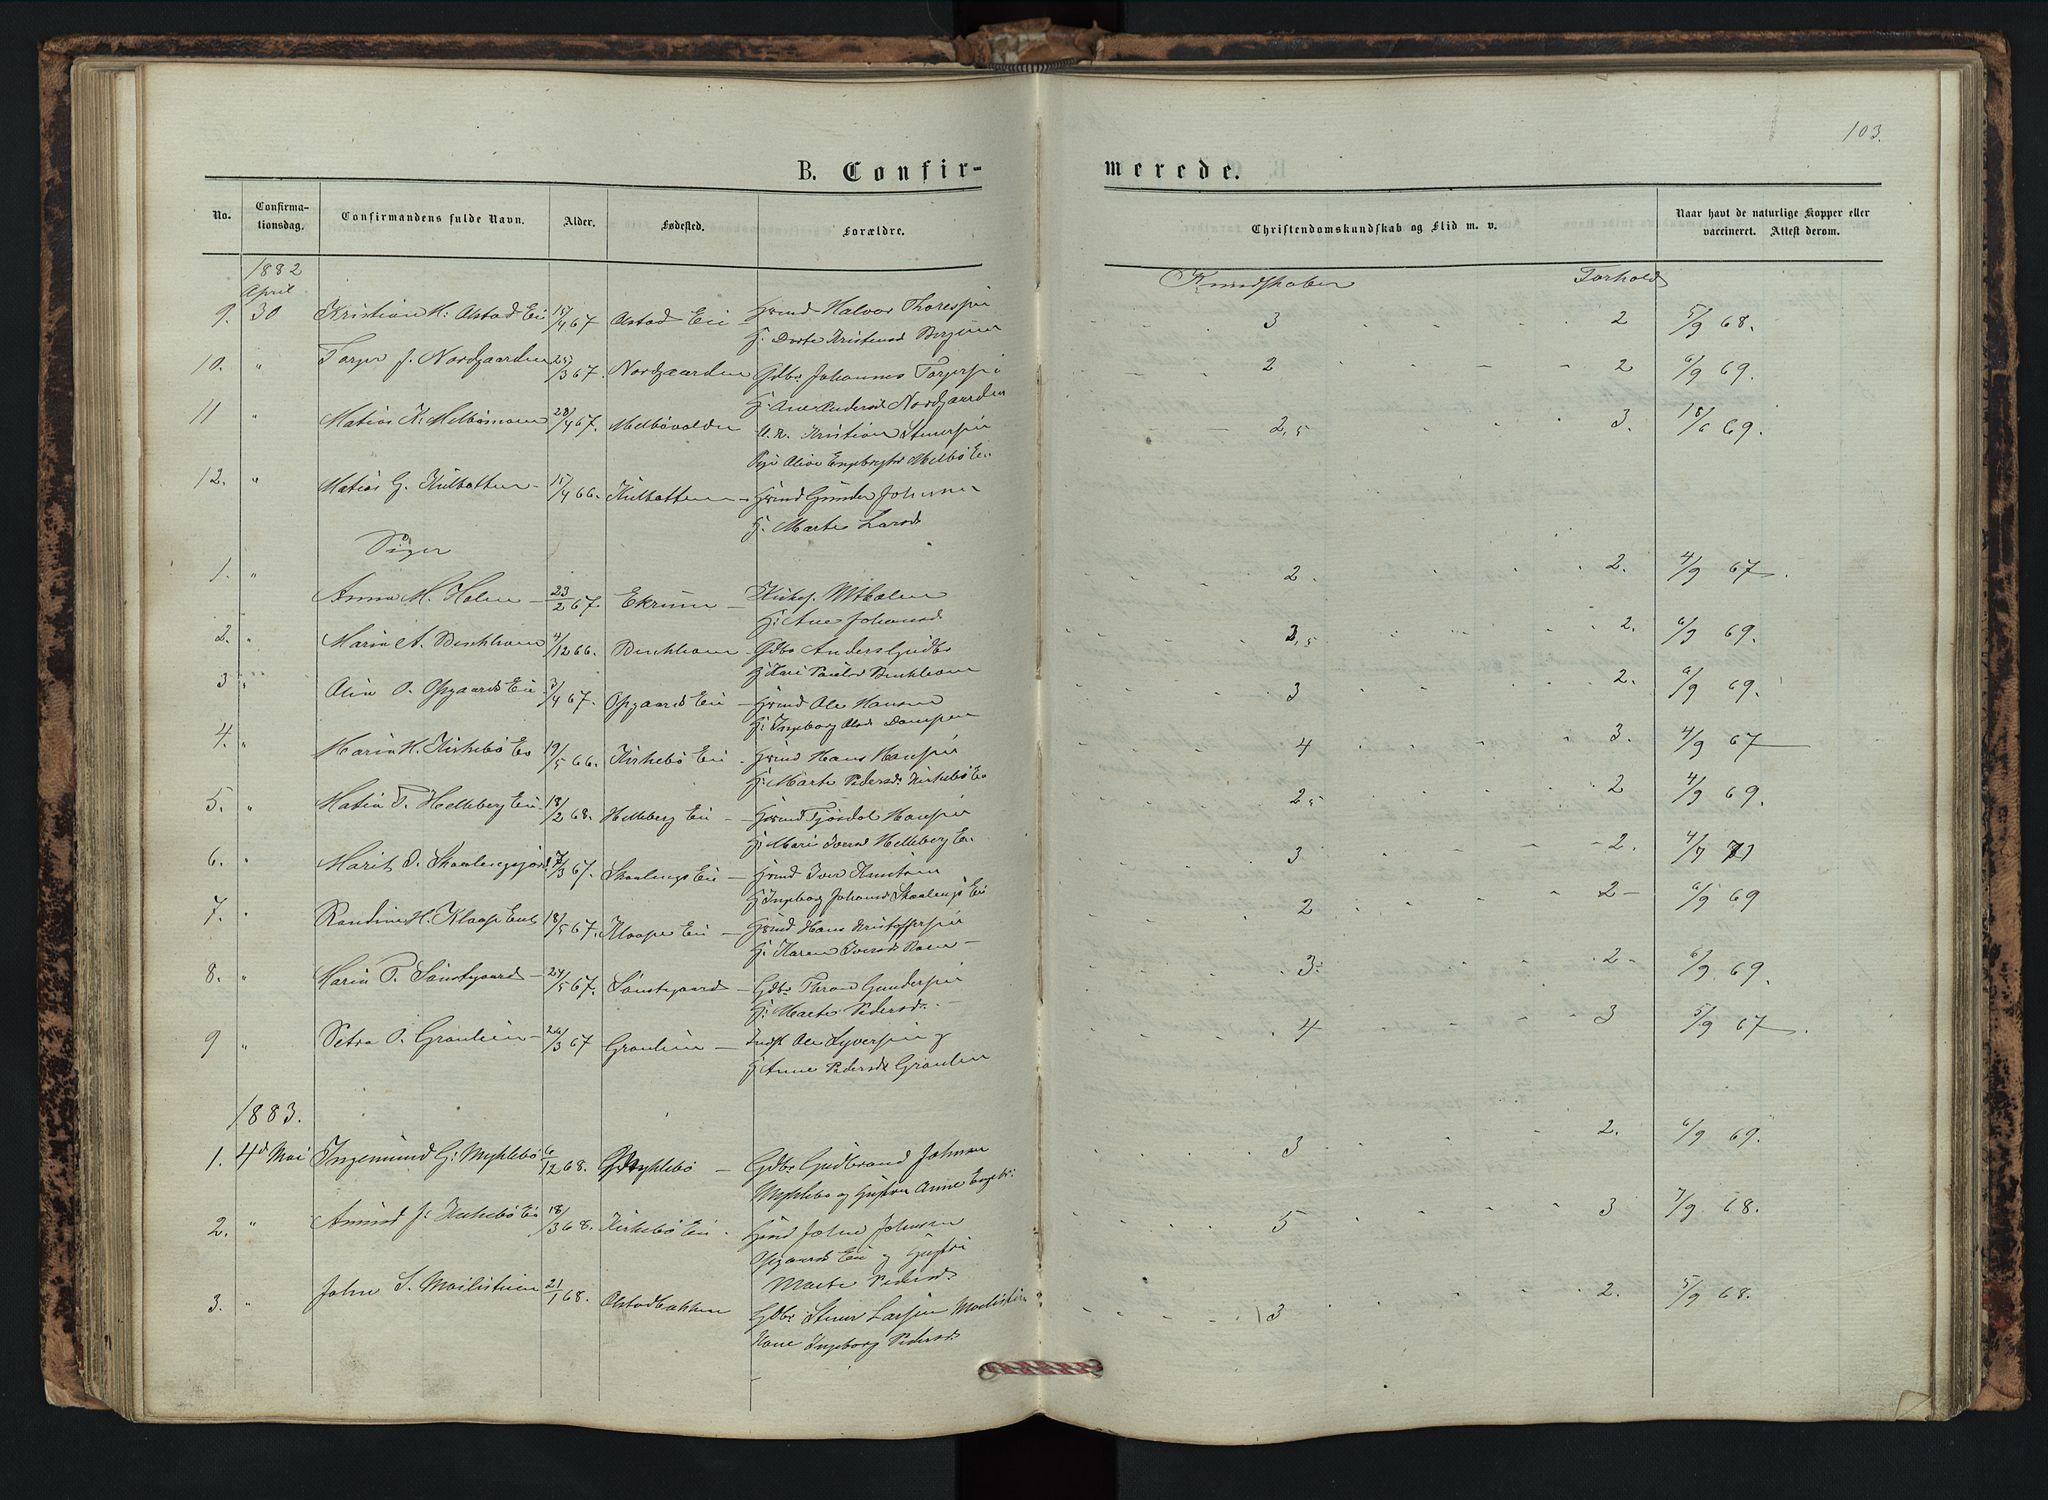 SAH, Vestre Gausdal prestekontor, Klokkerbok nr. 2, 1874-1897, s. 103